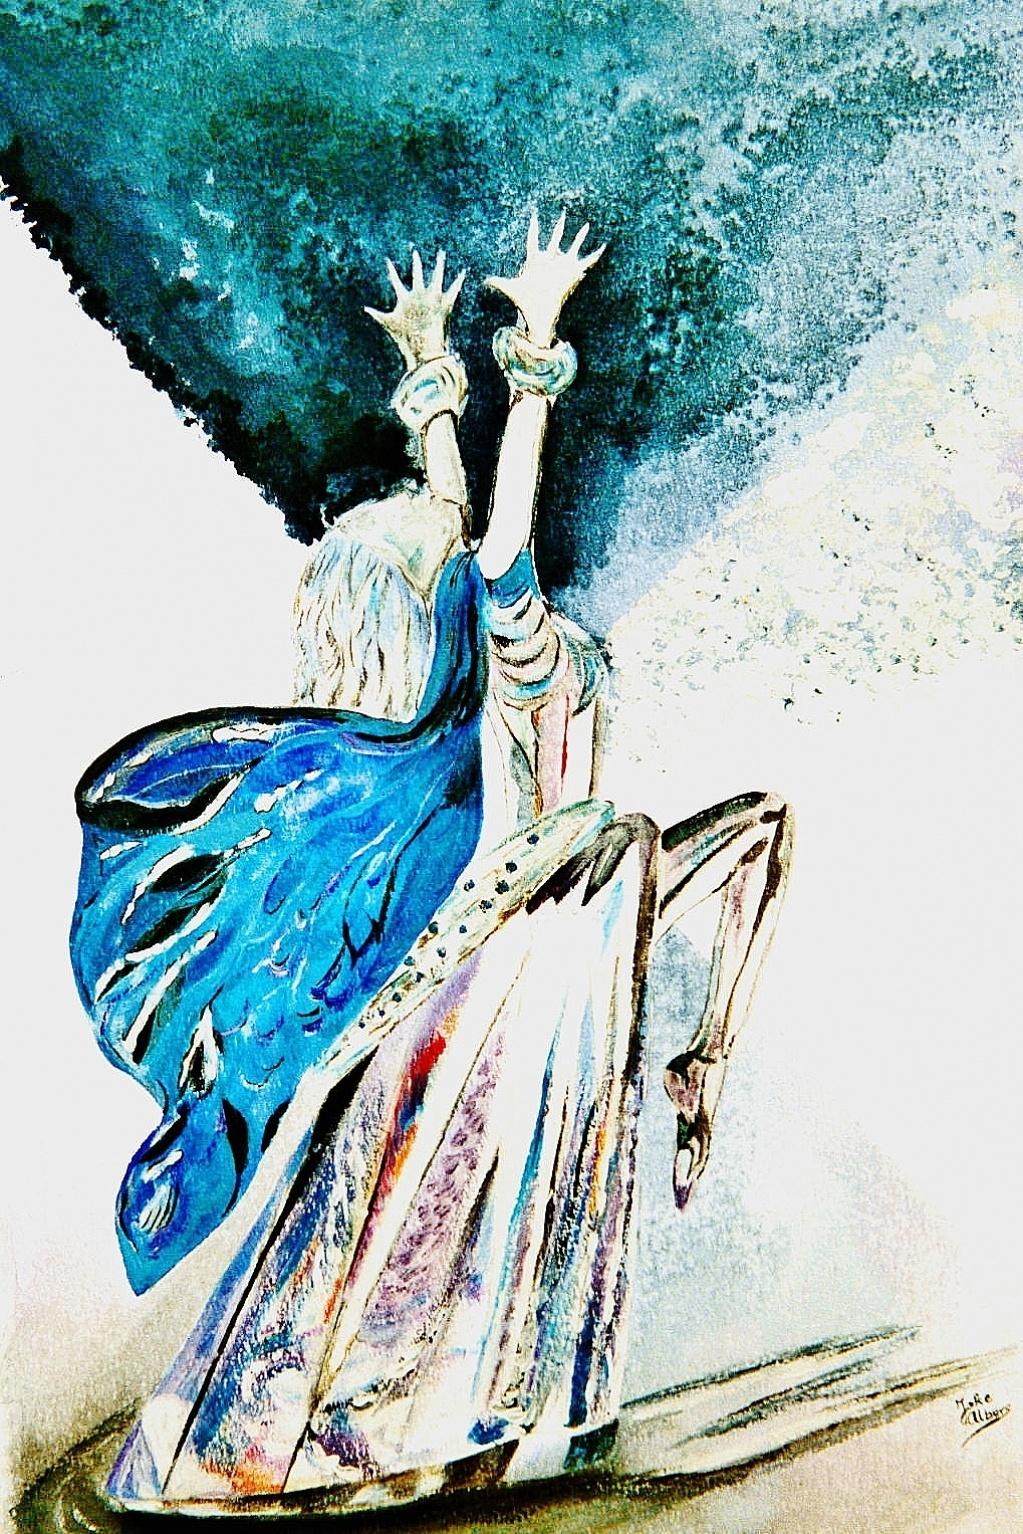 Crystal dance